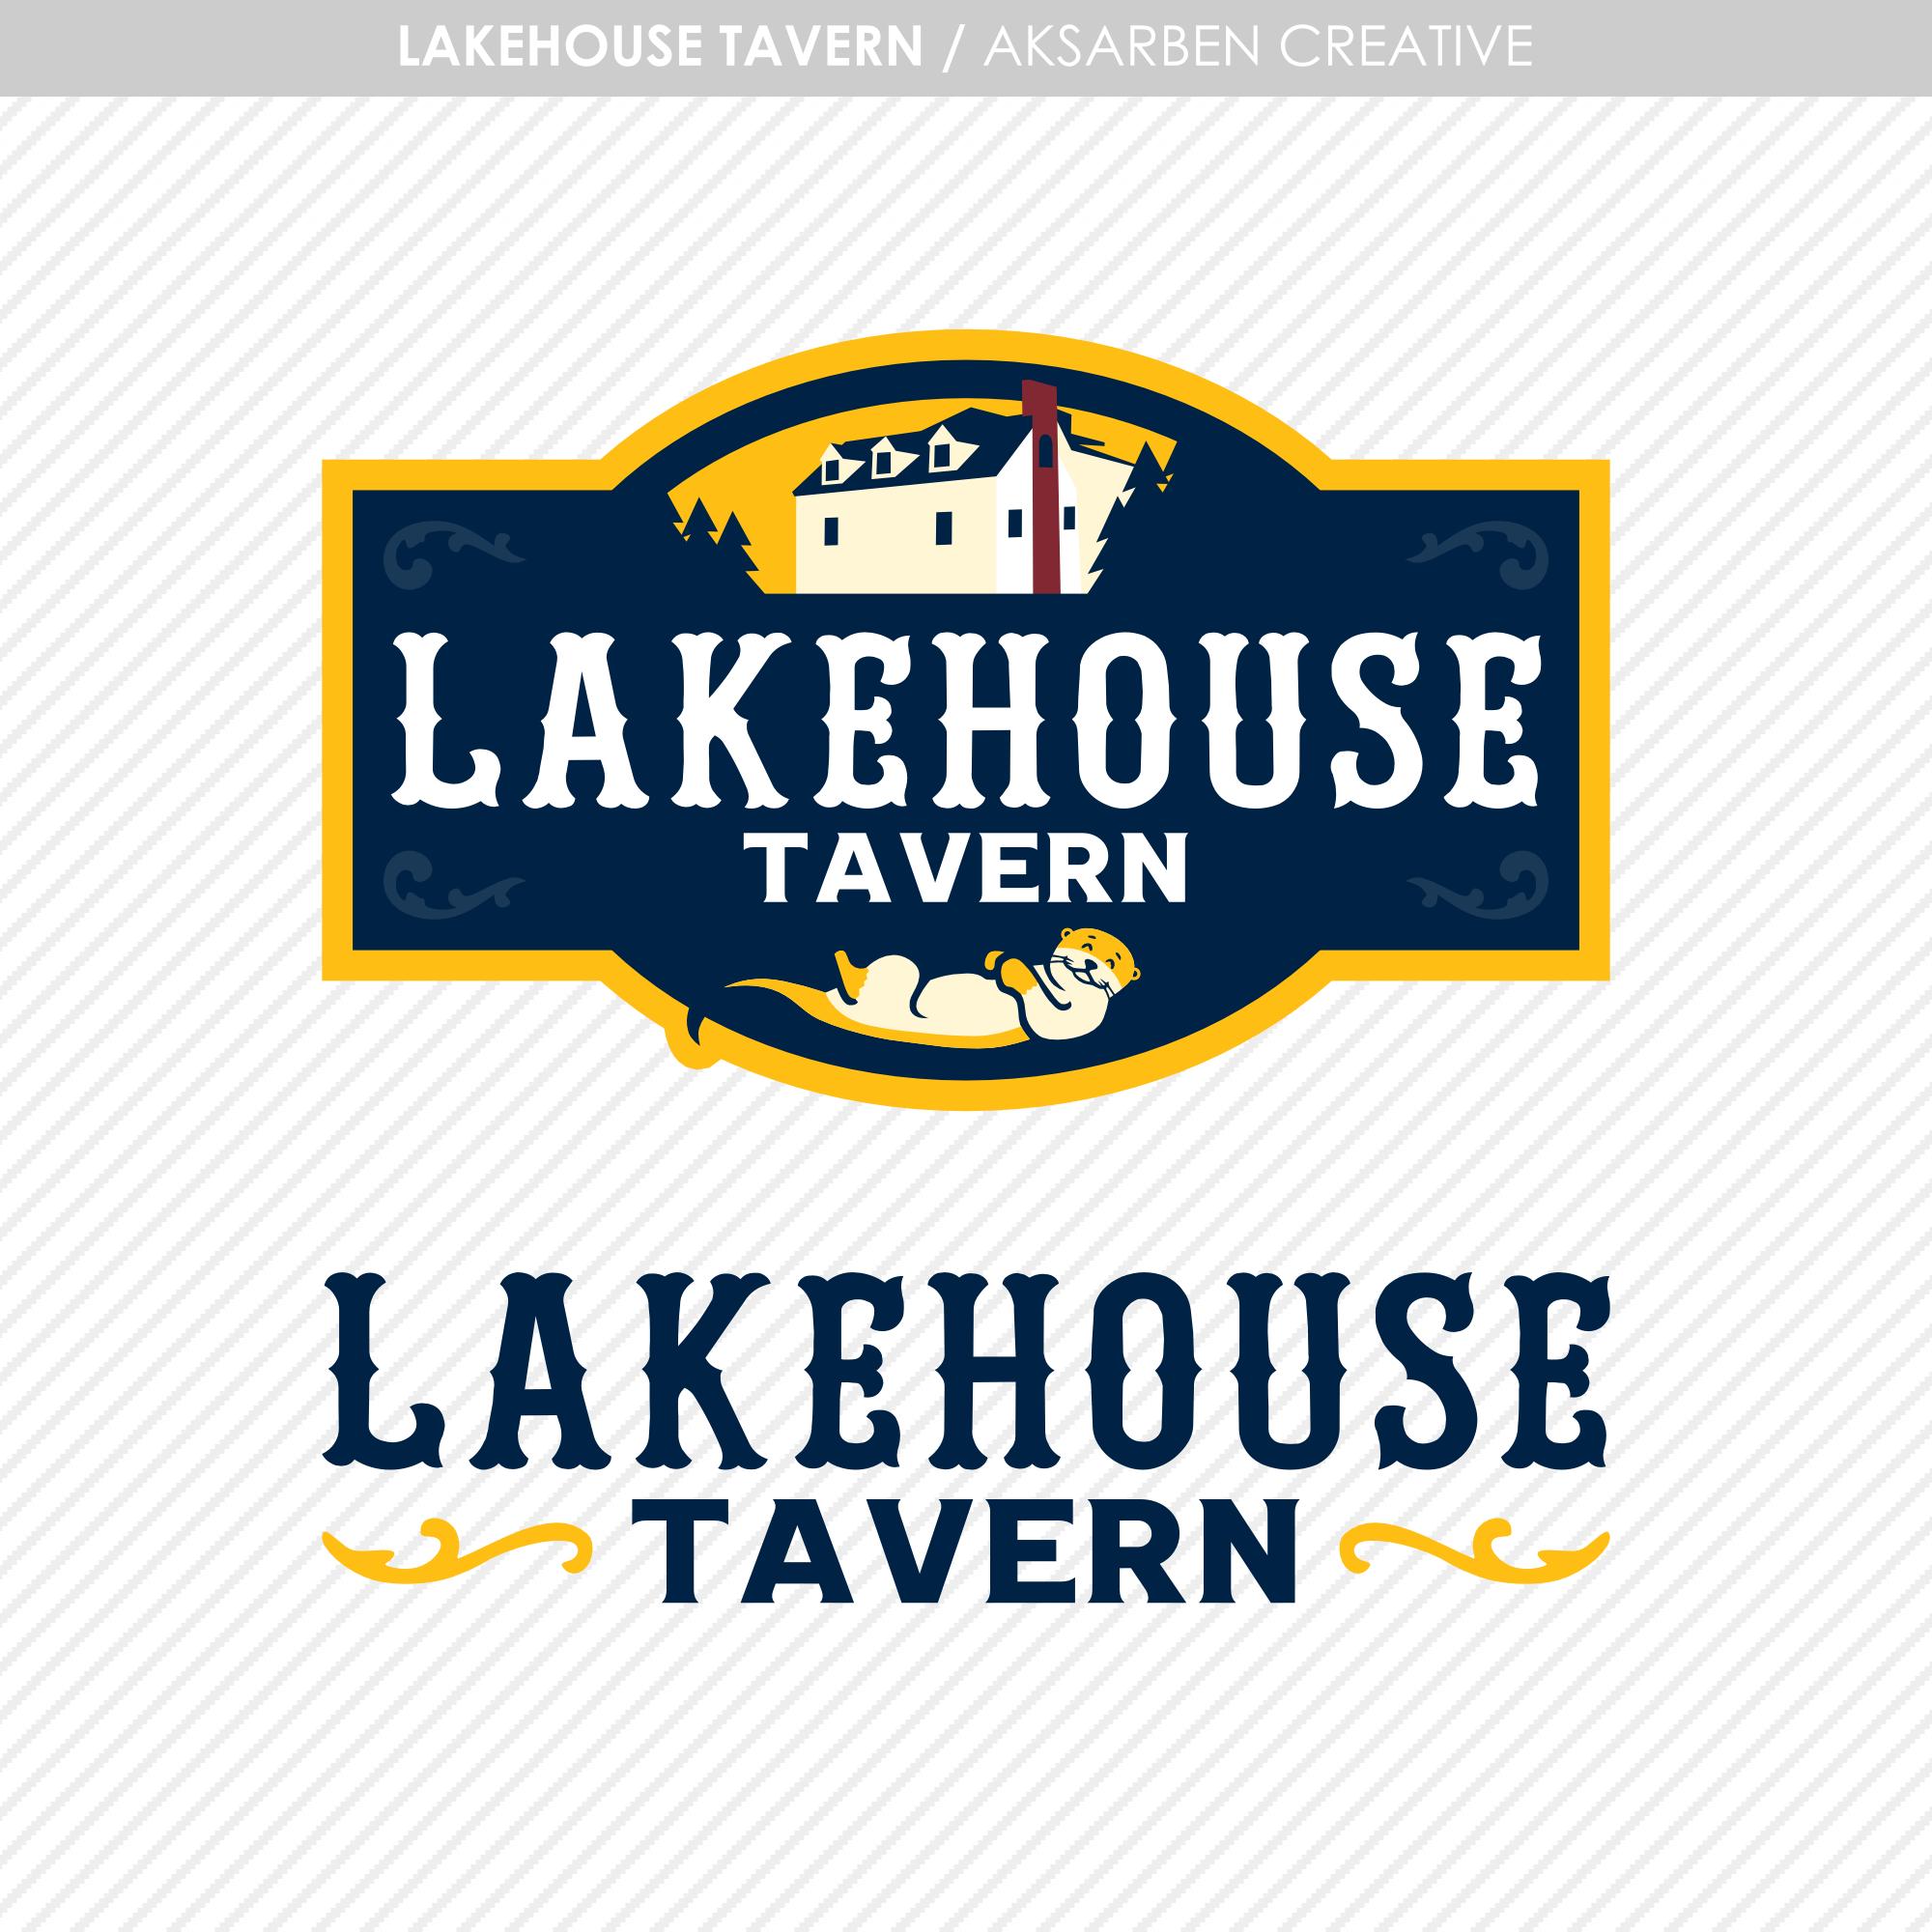 Lakehouse_Tavern_P7.png